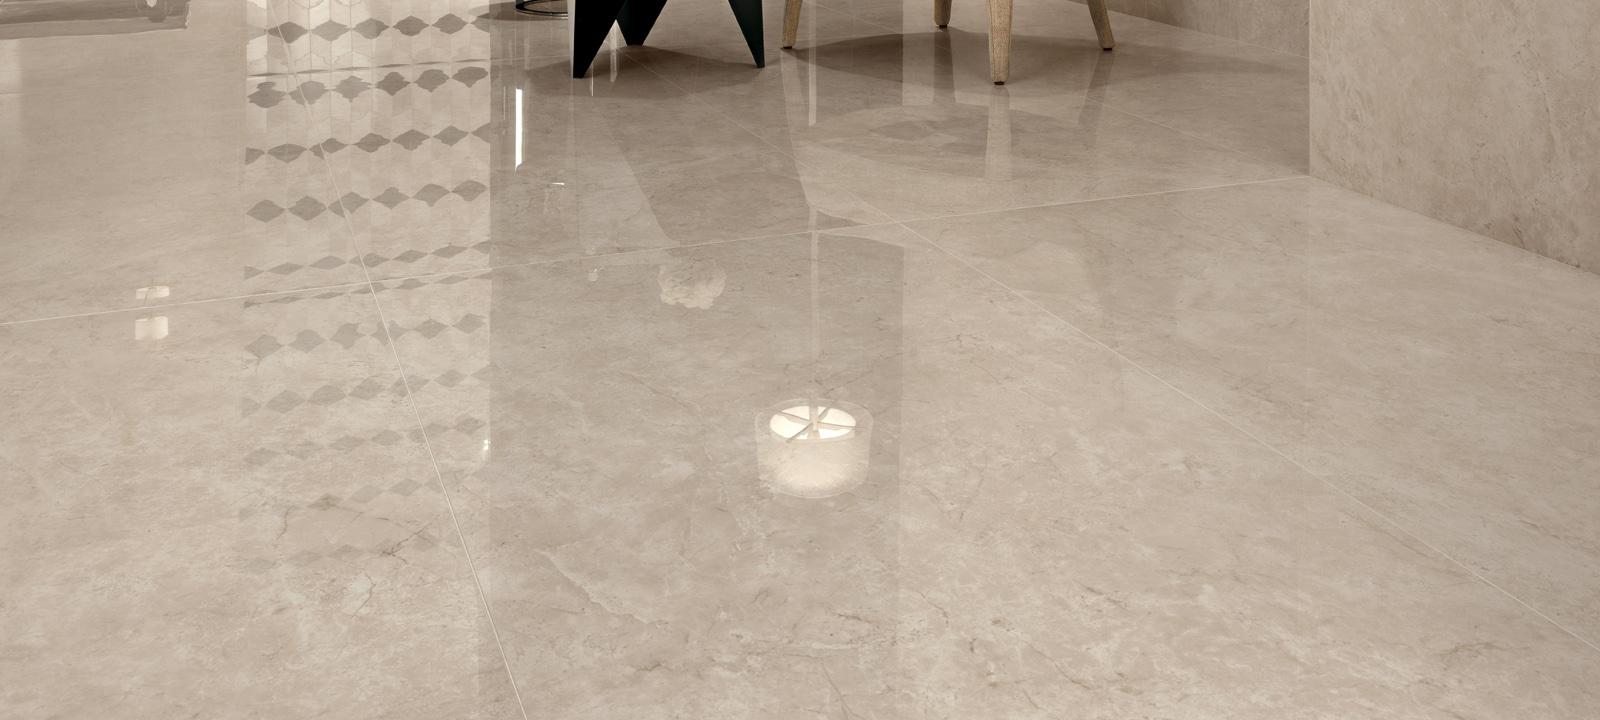 Crema Marfil Porcelain Tiles Minoli Marvel Cream Prestige